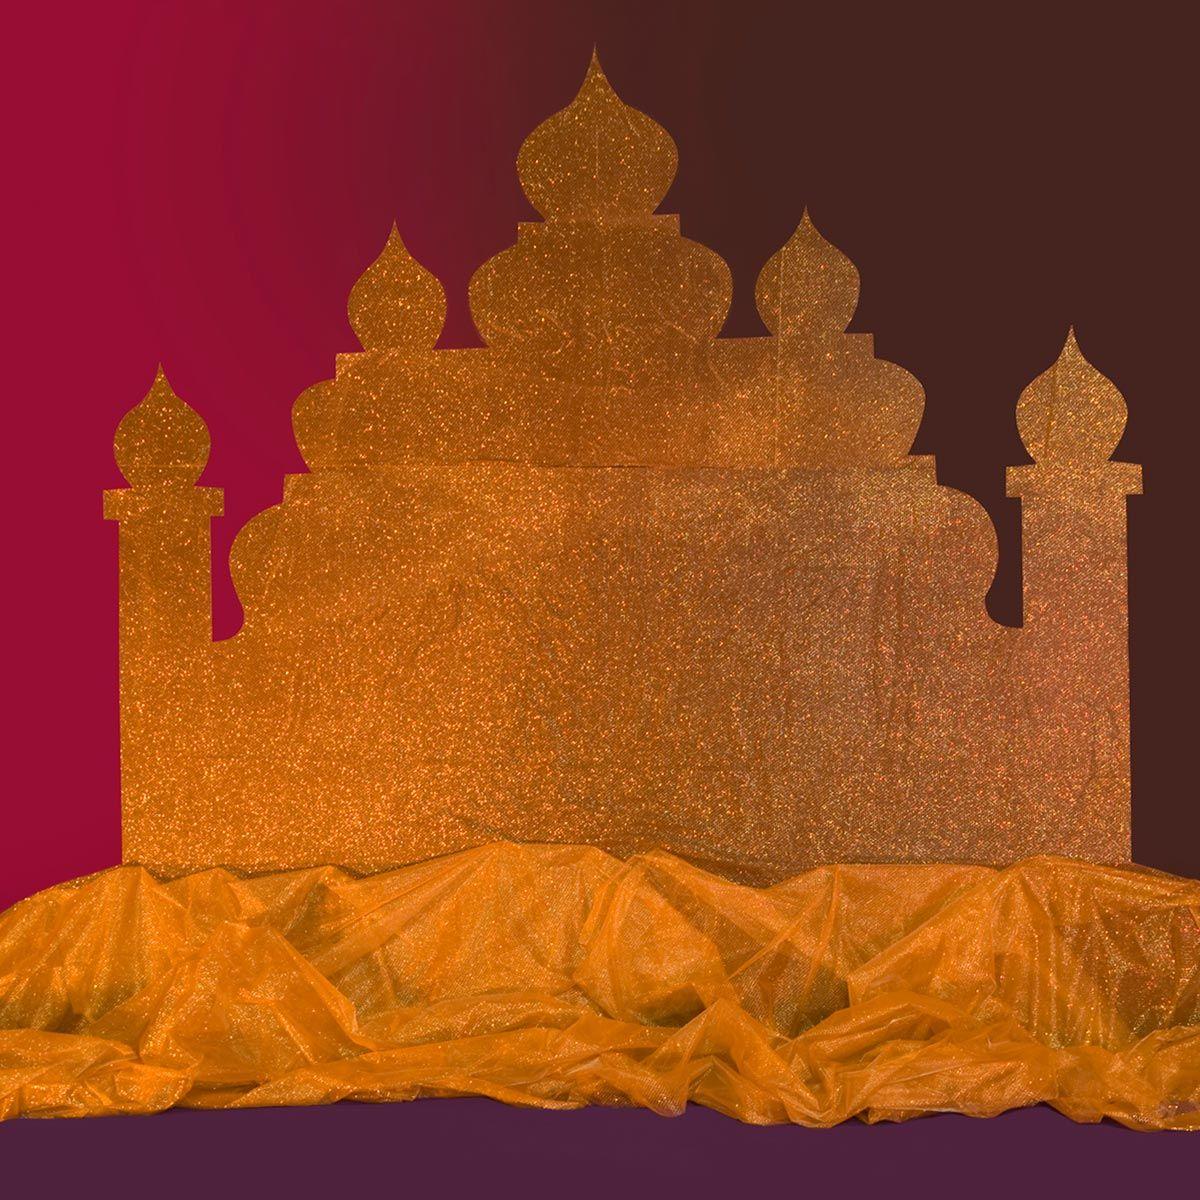 Arabian Nights Pelicula Completa Español arabian magic palace silhouette kit   arabian party, arabian